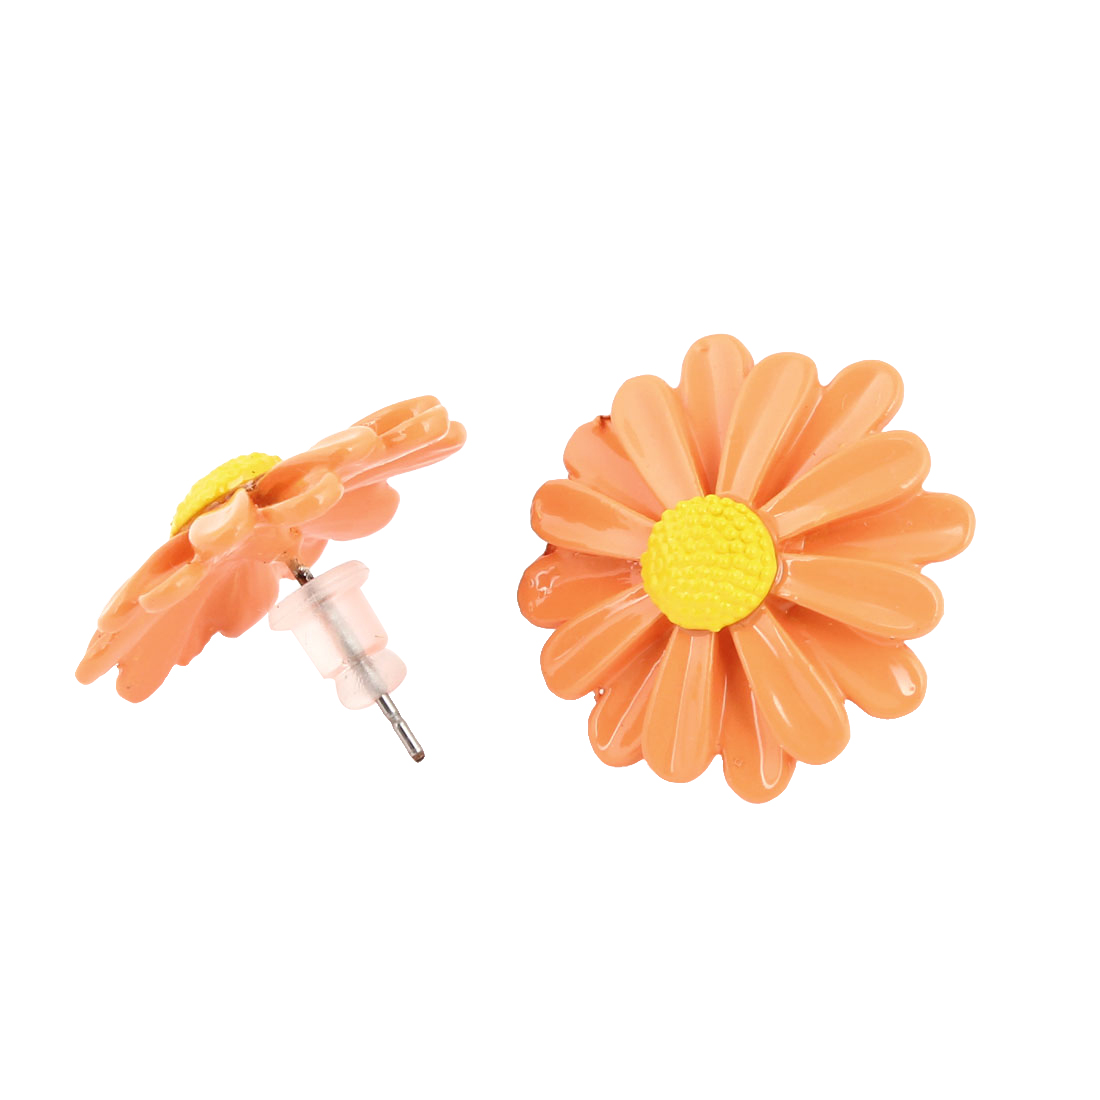 Ladies Ear Decoration Flower Shaped Ornament Stud Earrings Orange Yellow Pair